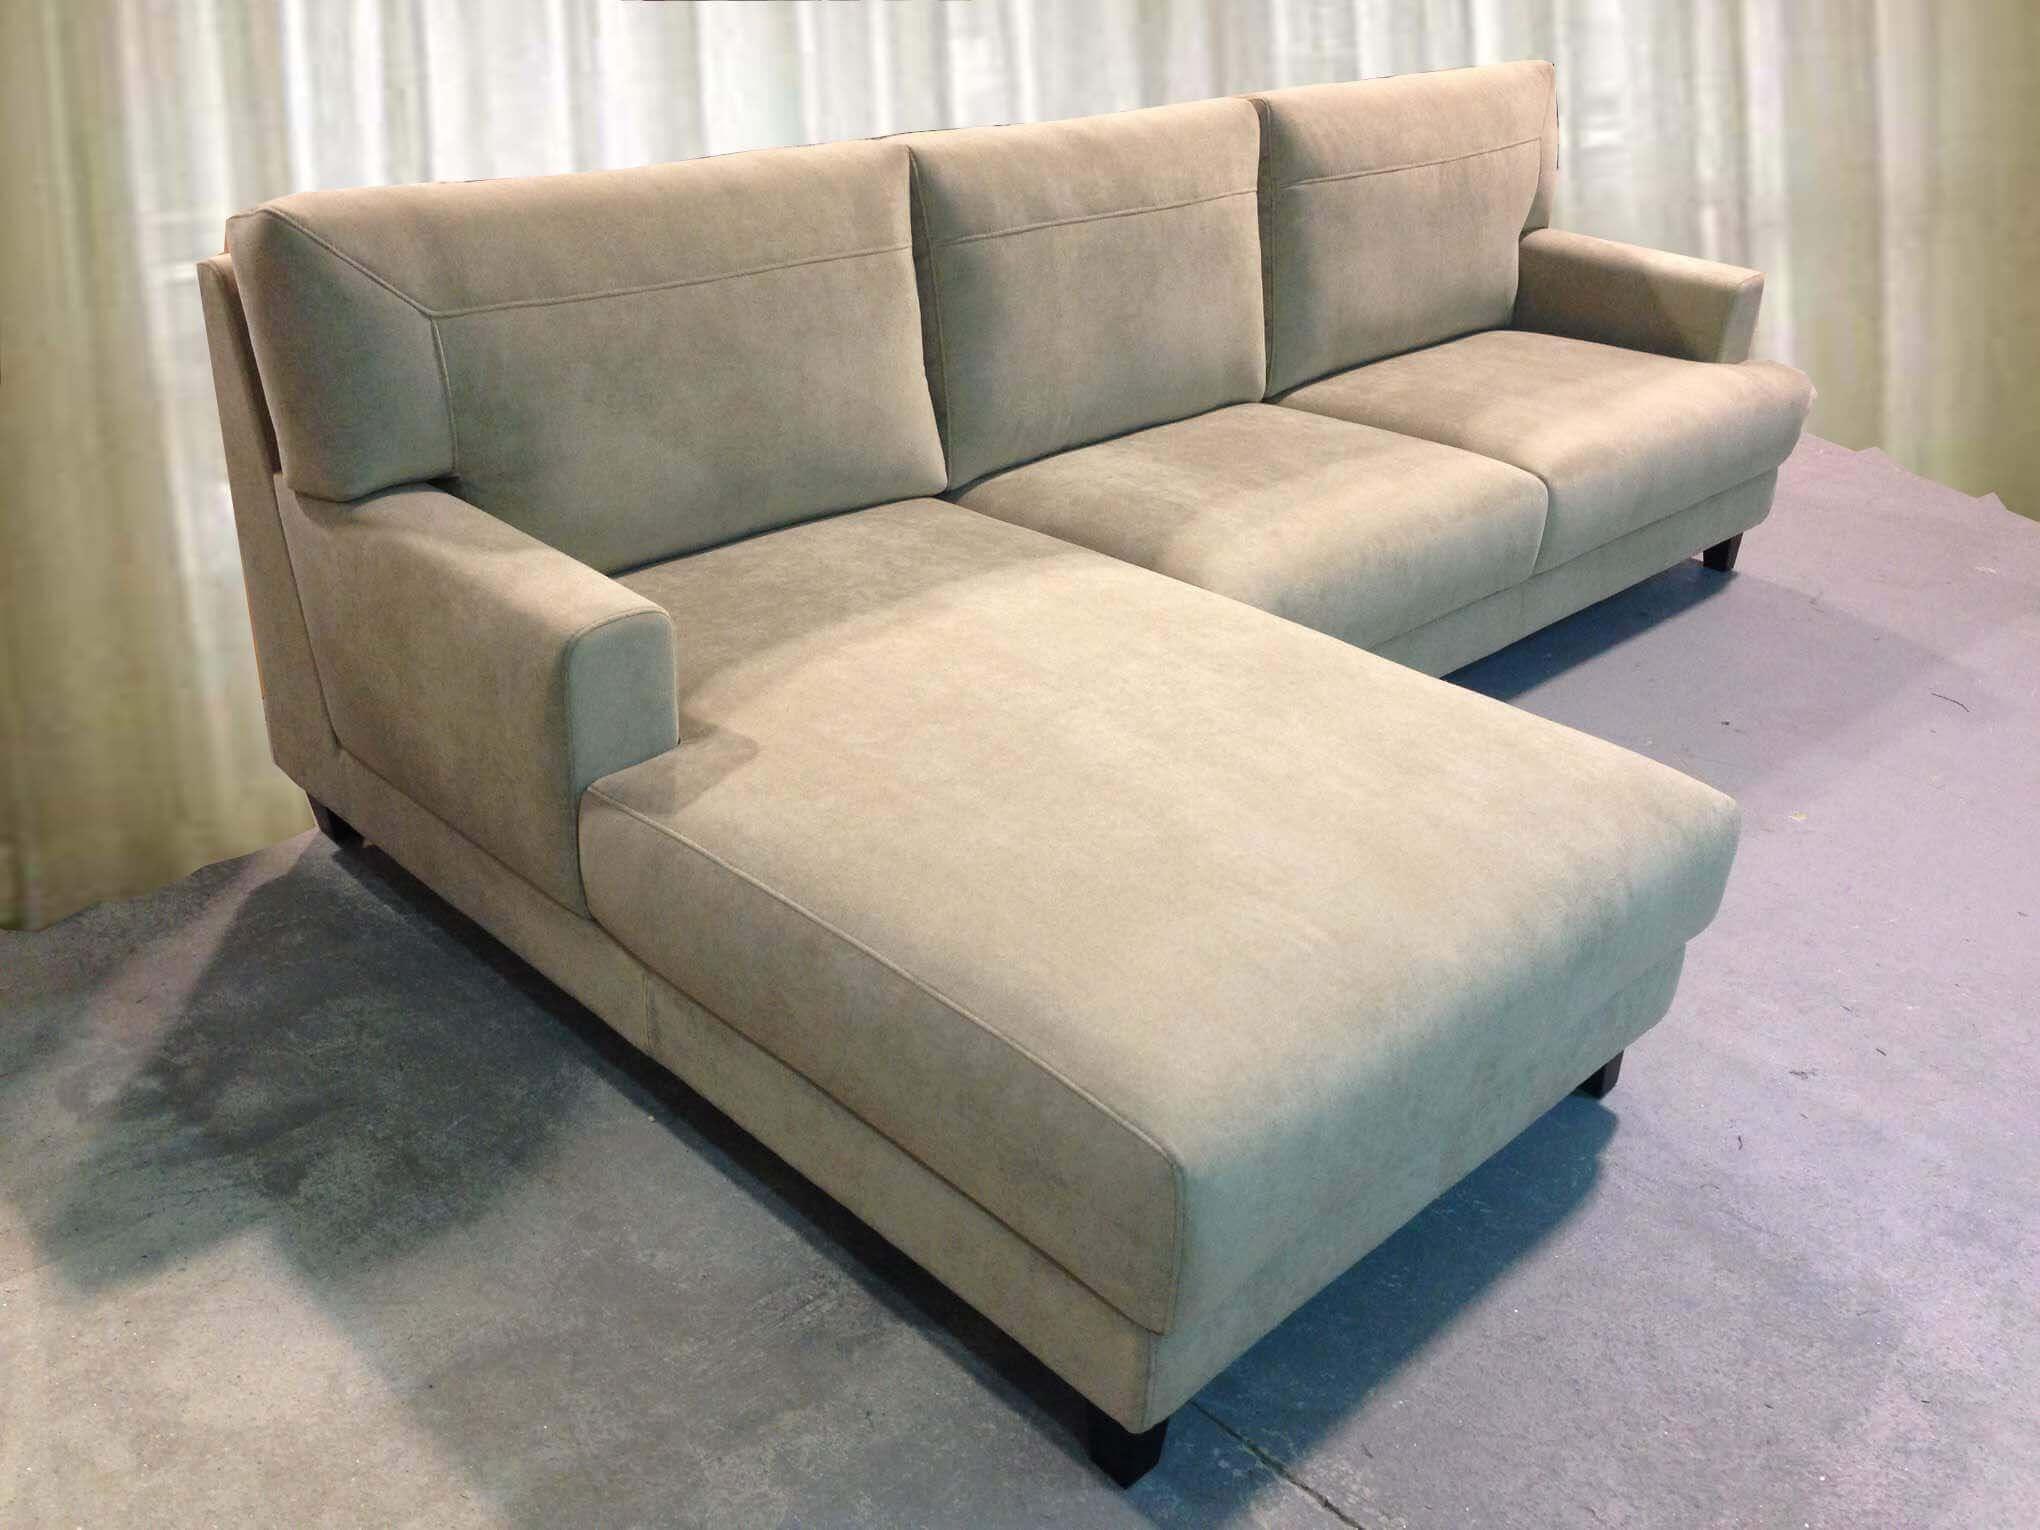 Sofa Chaise Crispalef ref SofaChaise001